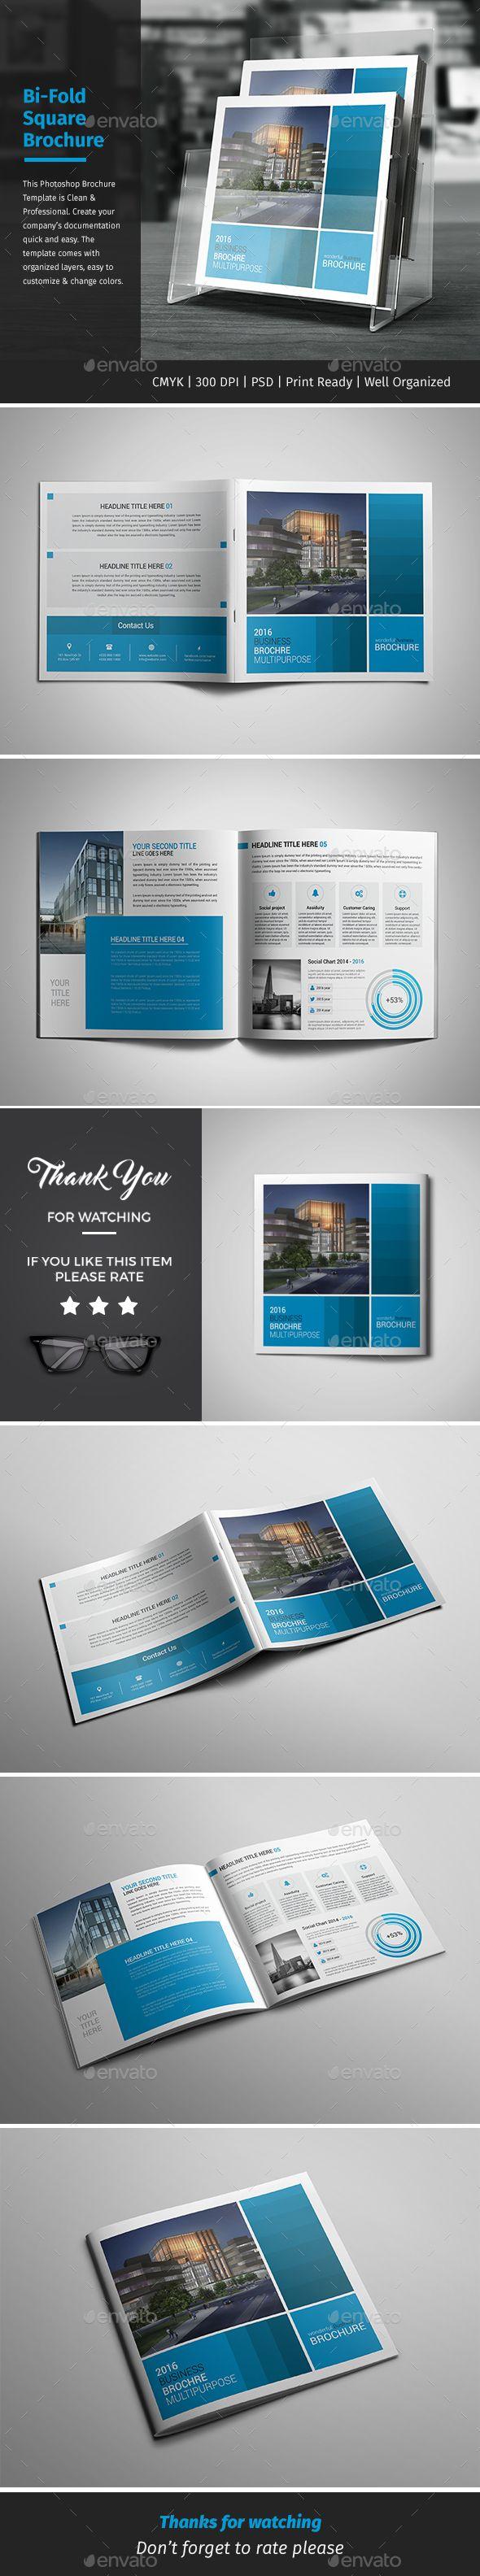 Corporate Bifold Square Brochure 08  — PSD Template #marketing #scheme • Download ➝ https://graphicriver.net/item/corporate-bifold-square-brochure-08/18087019?ref=pxcr